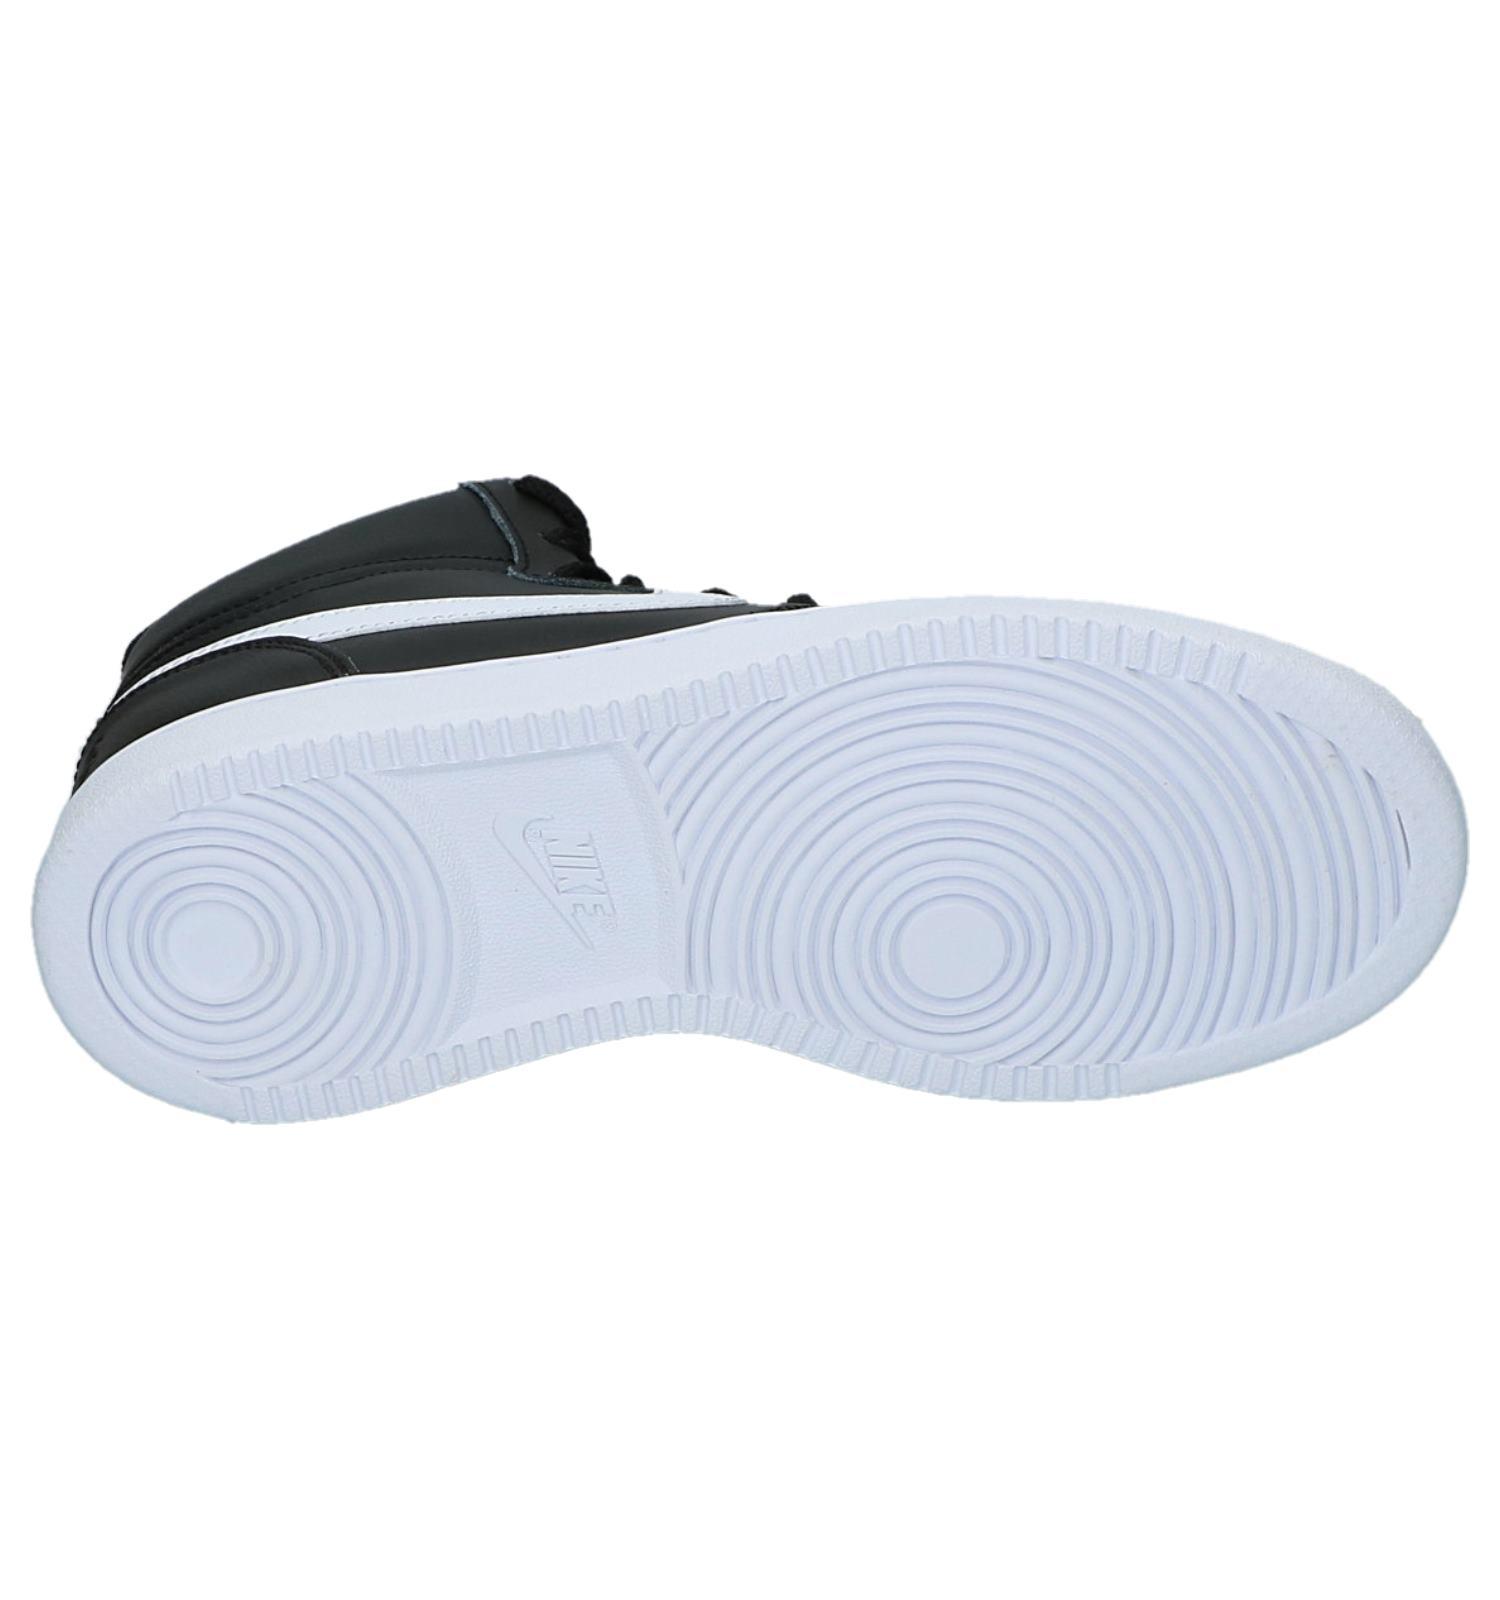 online store d47f1 d747b Zwarte Sneakers Nike Ebernon Mid   TORFS.BE   Gratis verzend en retour